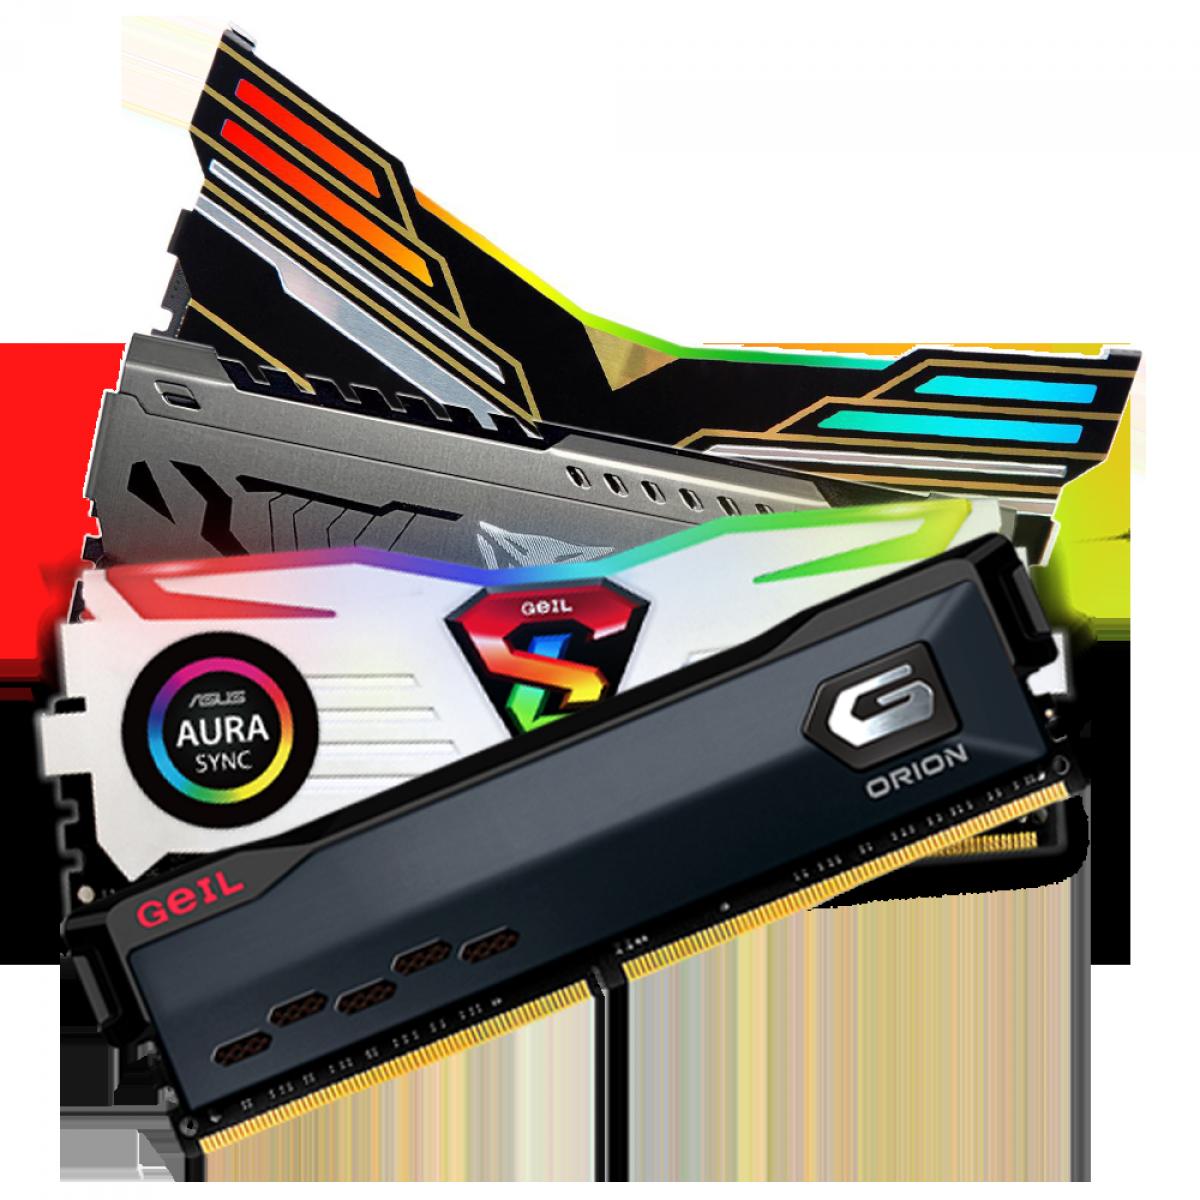 Kit Upgrade Asrock B450M Steel Legend + AMD Ryzen 5 PRO 4650G 3.7GHz + 16GB (2x8GB) DDR4 3000MHz